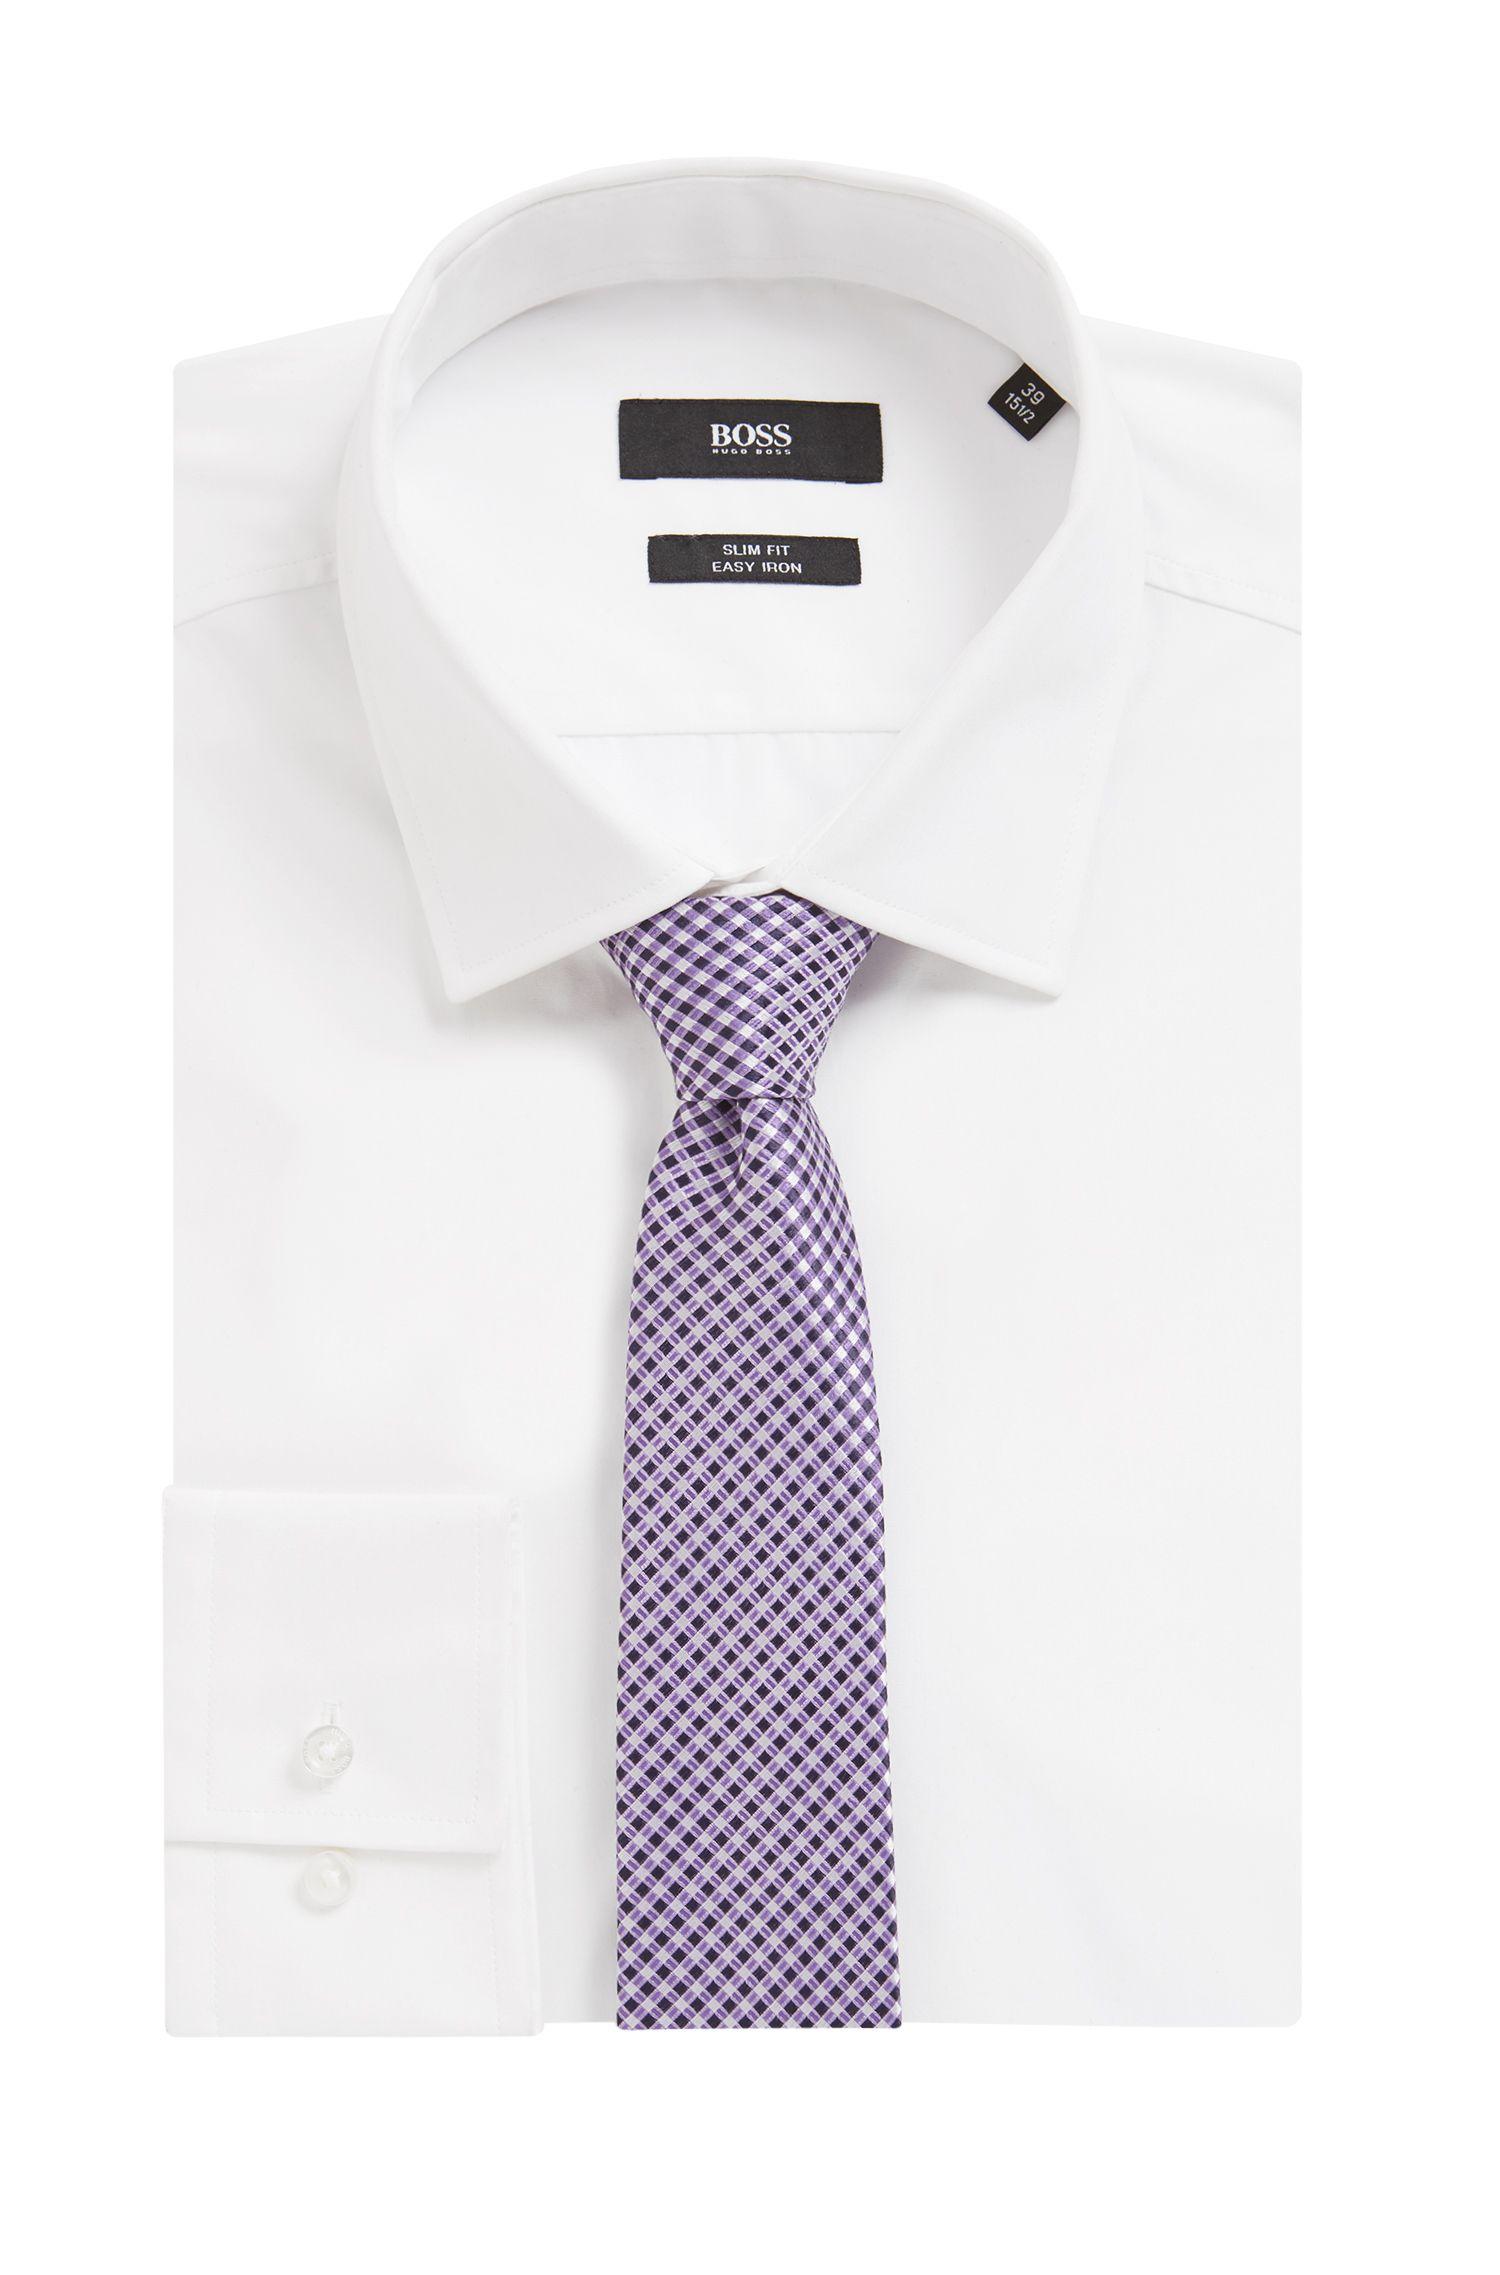 Slimline patterned tie in water-repellent silk jacquard, Purple